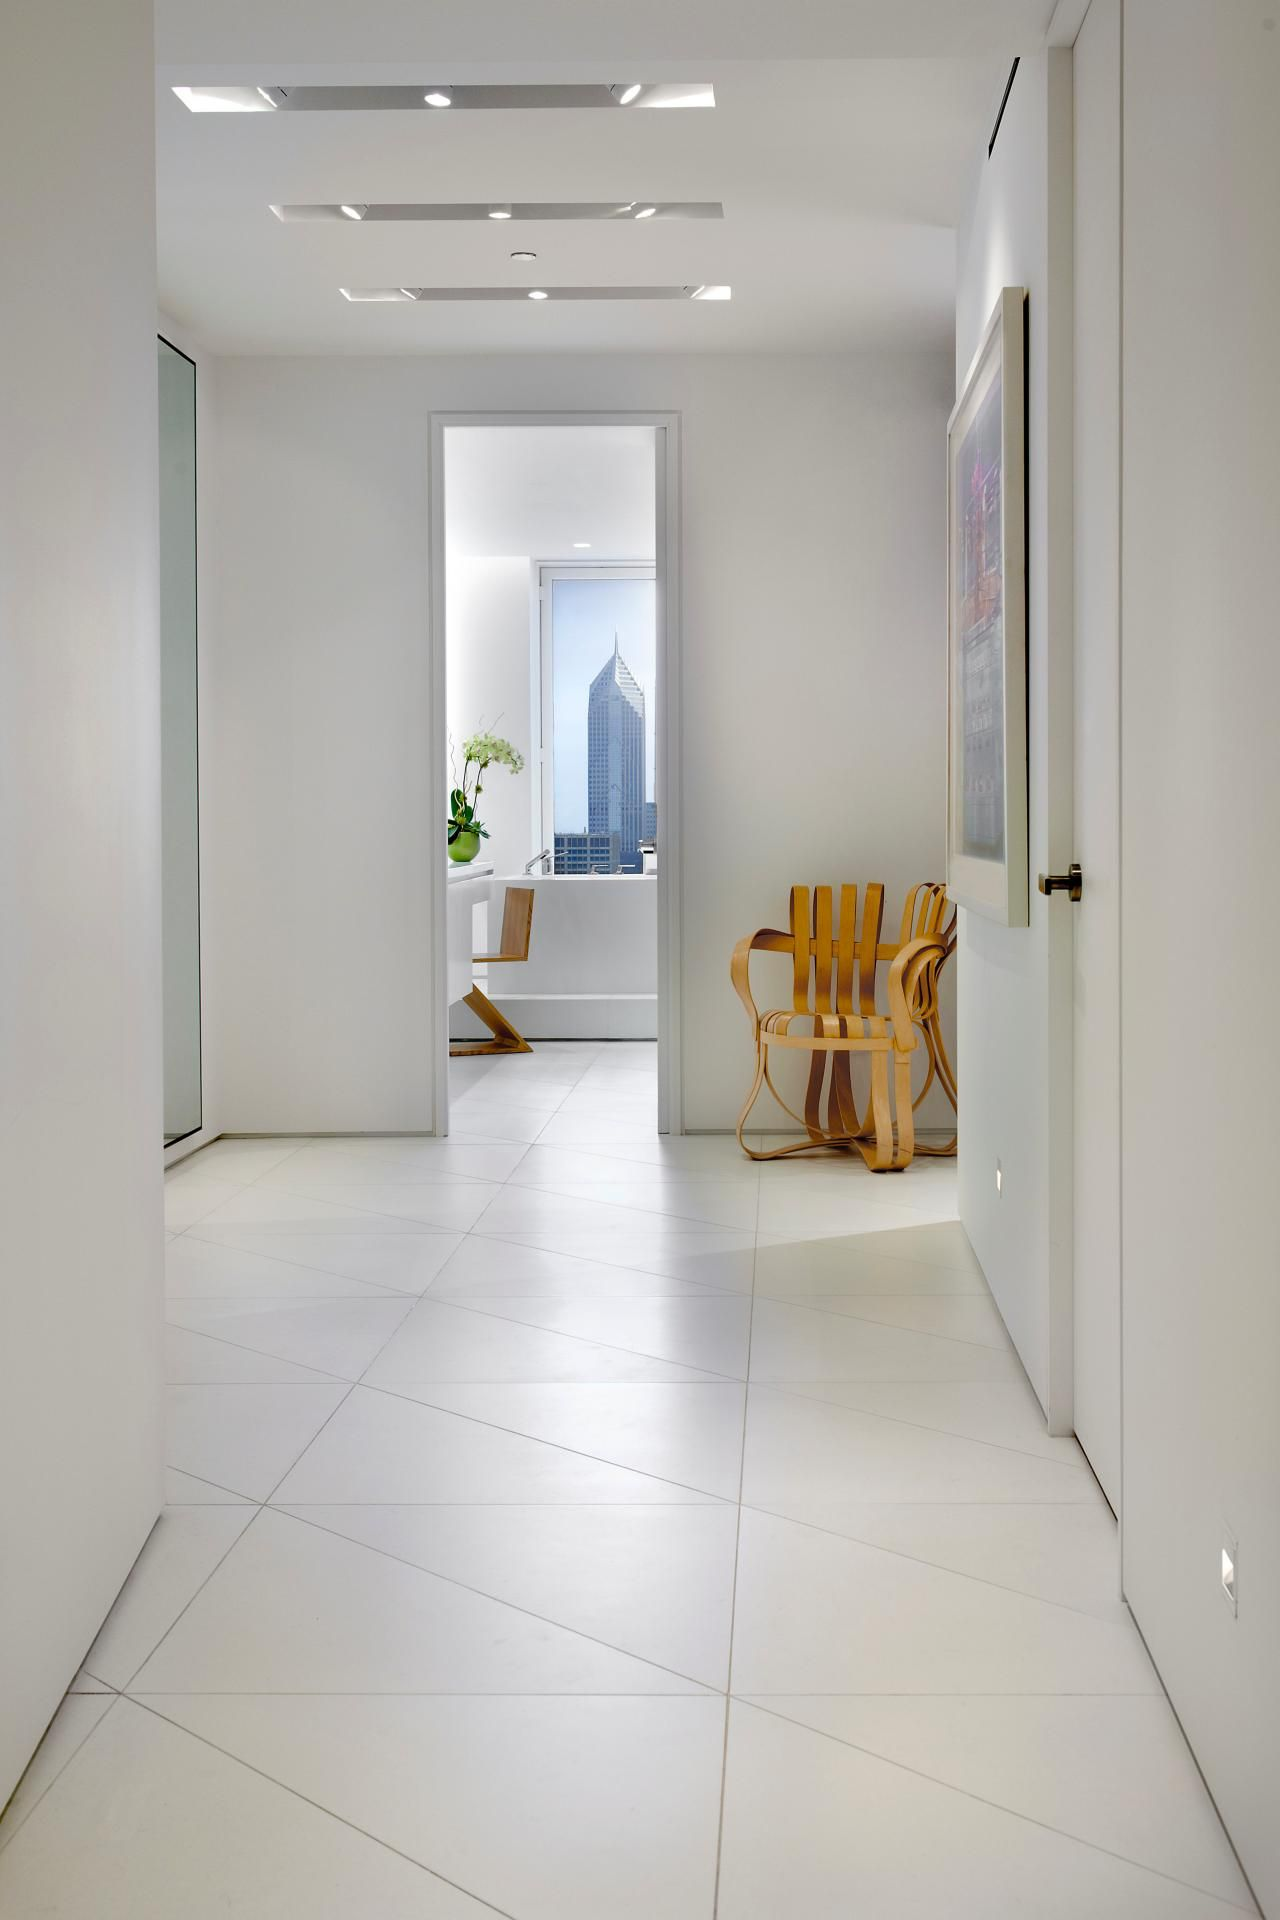 photos hgtv modern white hallway with triangular tile floor diy home decor ideas home